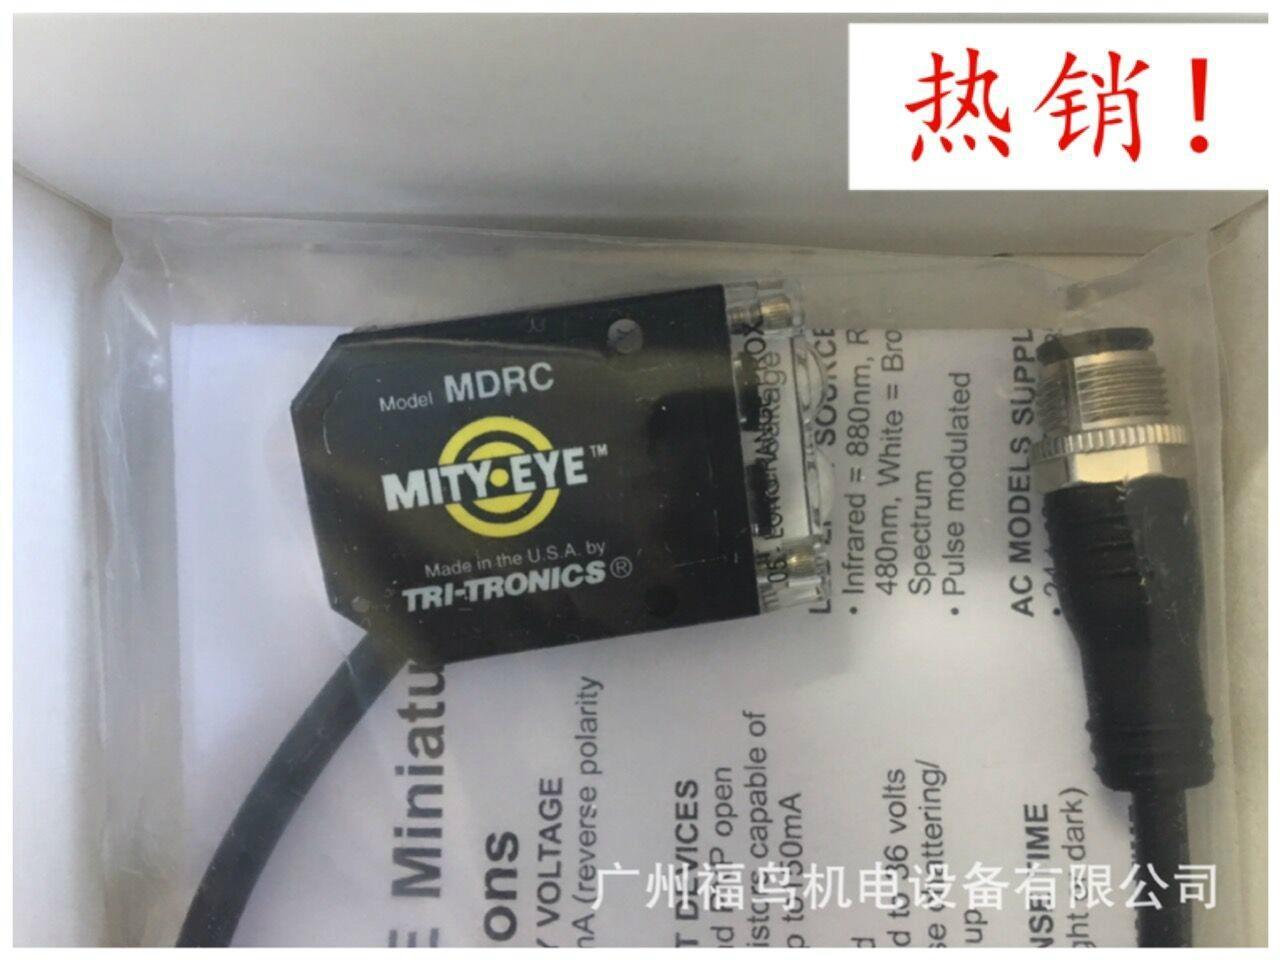 TRI-TRONICS传感器, 光电开关, 型号: MDRC 05